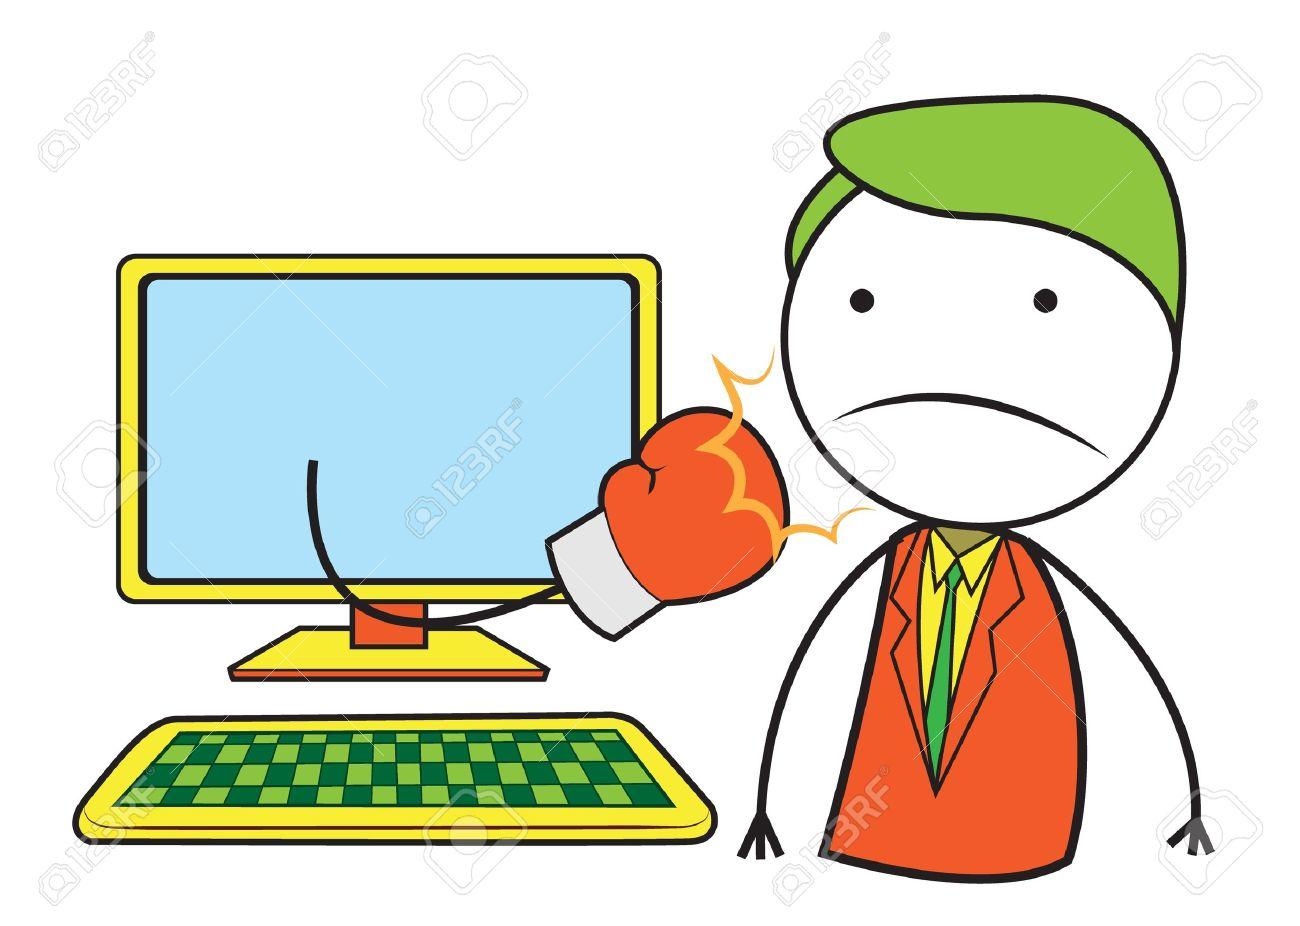 Cyber bully clipart ClipartFox cyberbullying internet bully. Cyber bully clipart ClipartFox cyberbullying internet bully